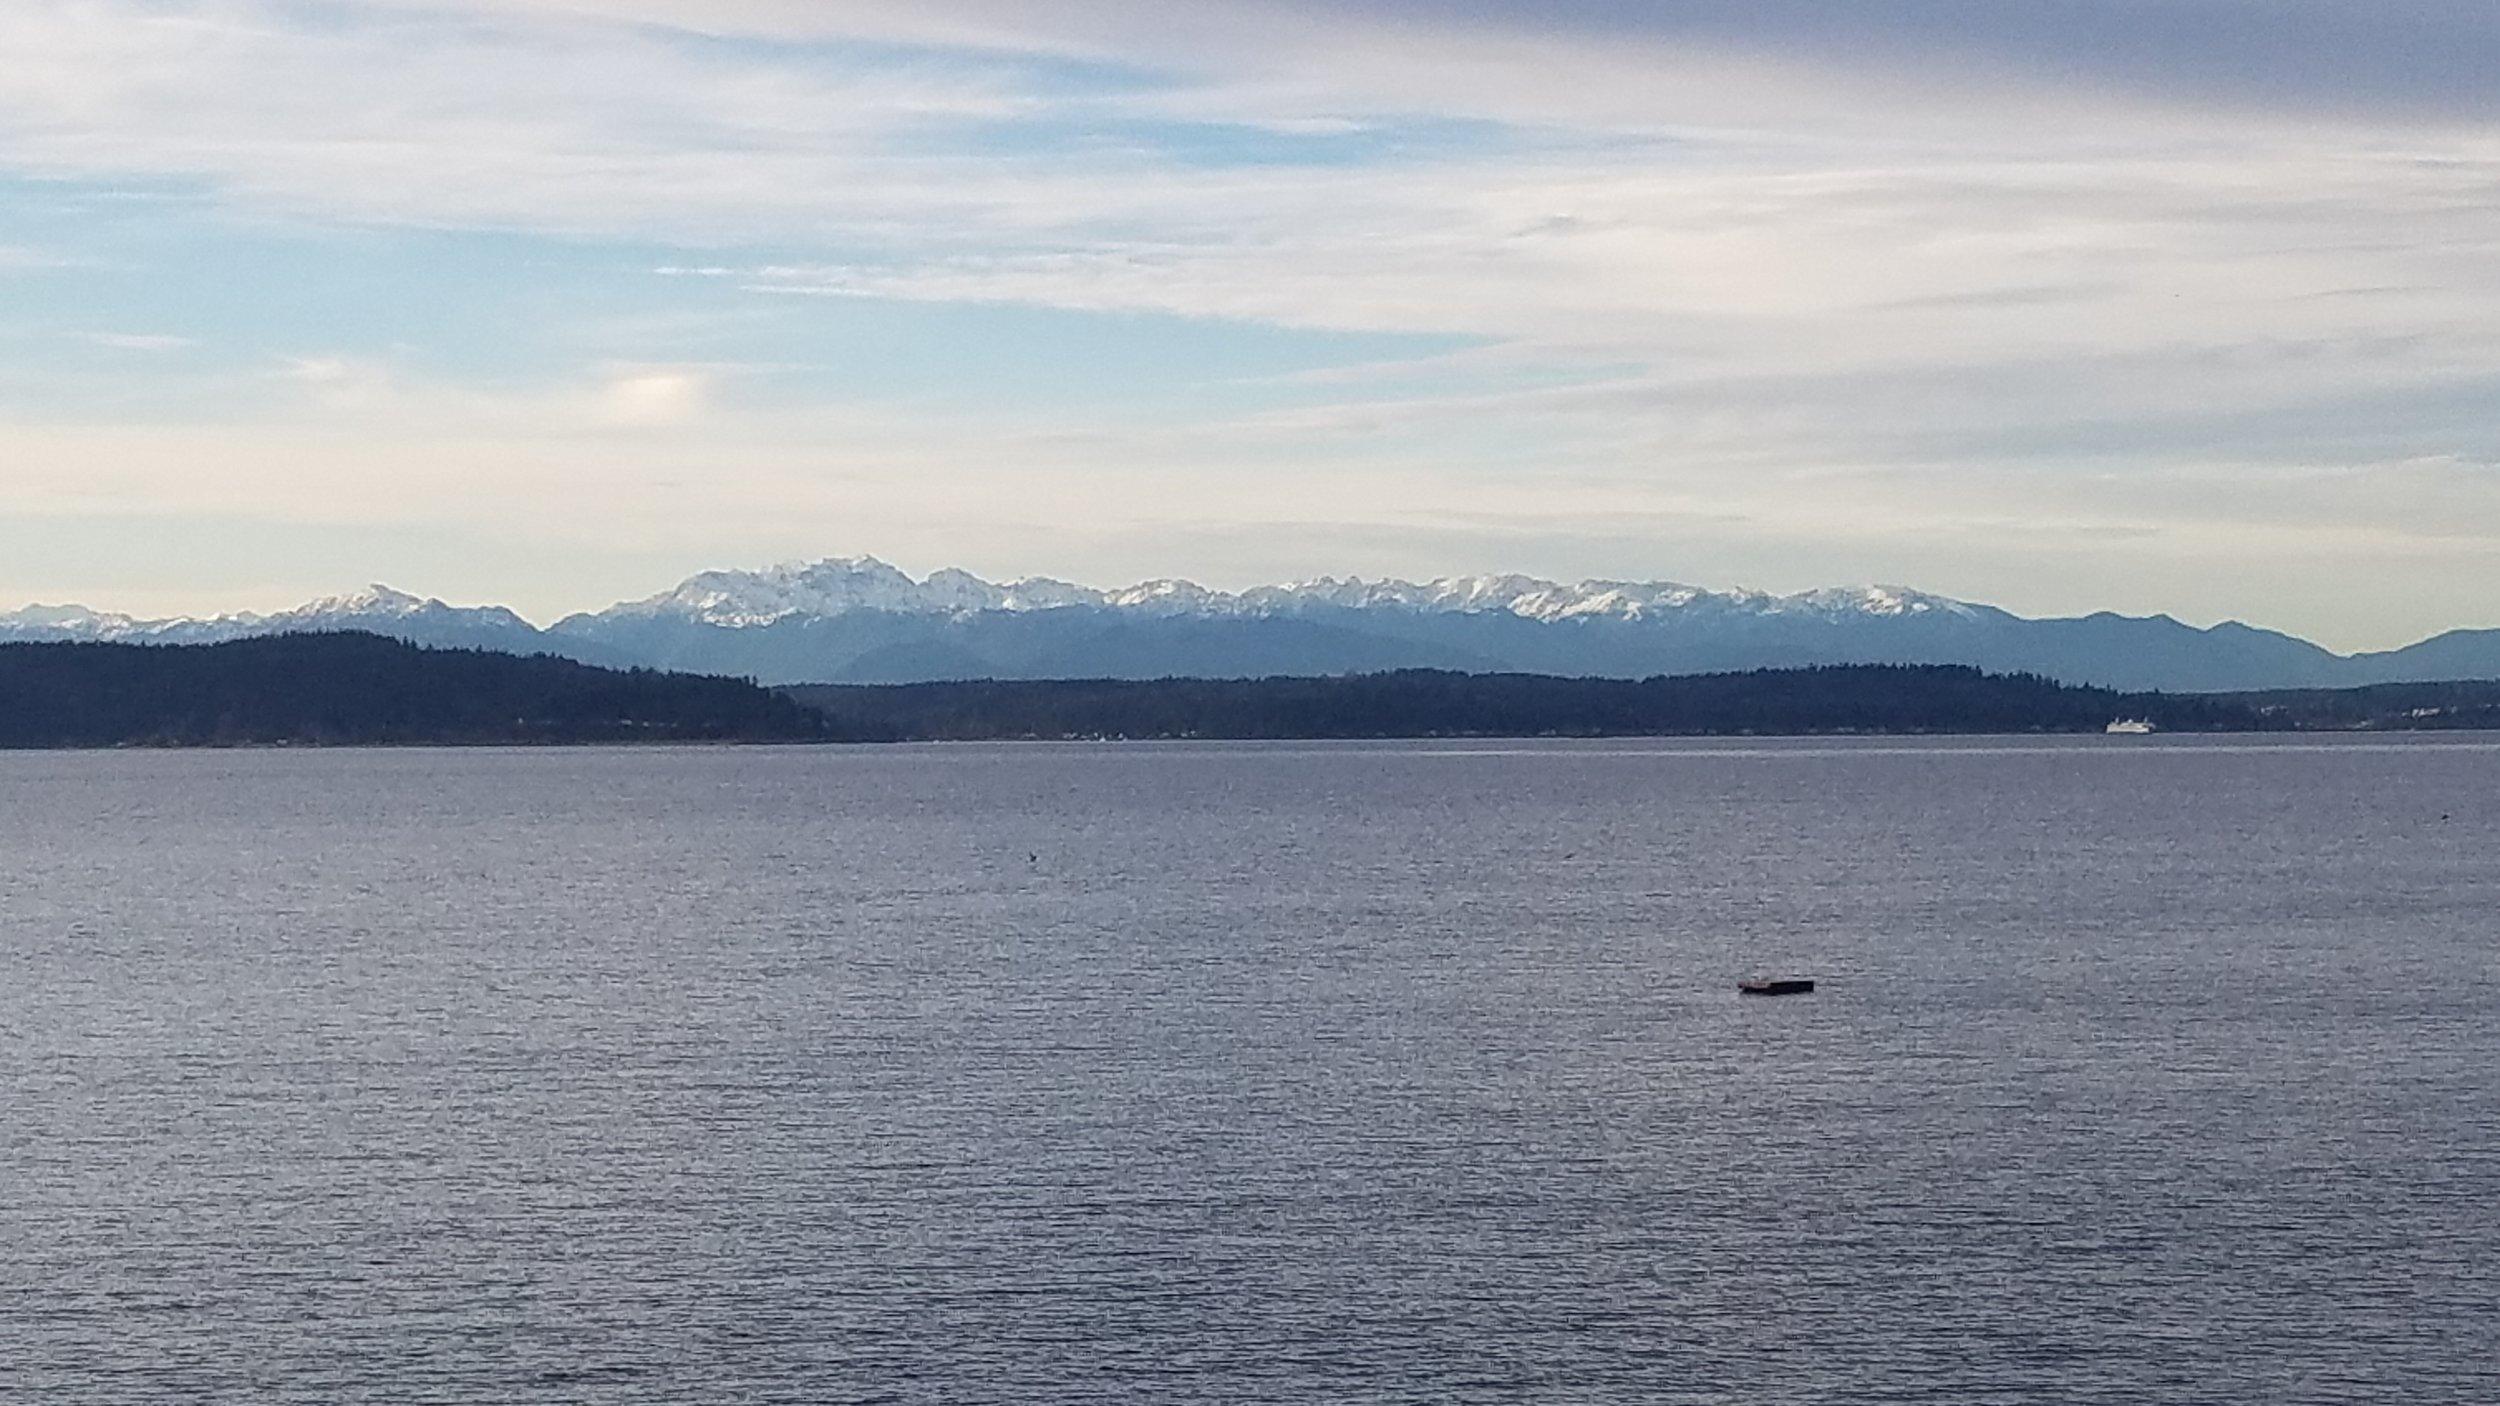 Current: Seattle, WA